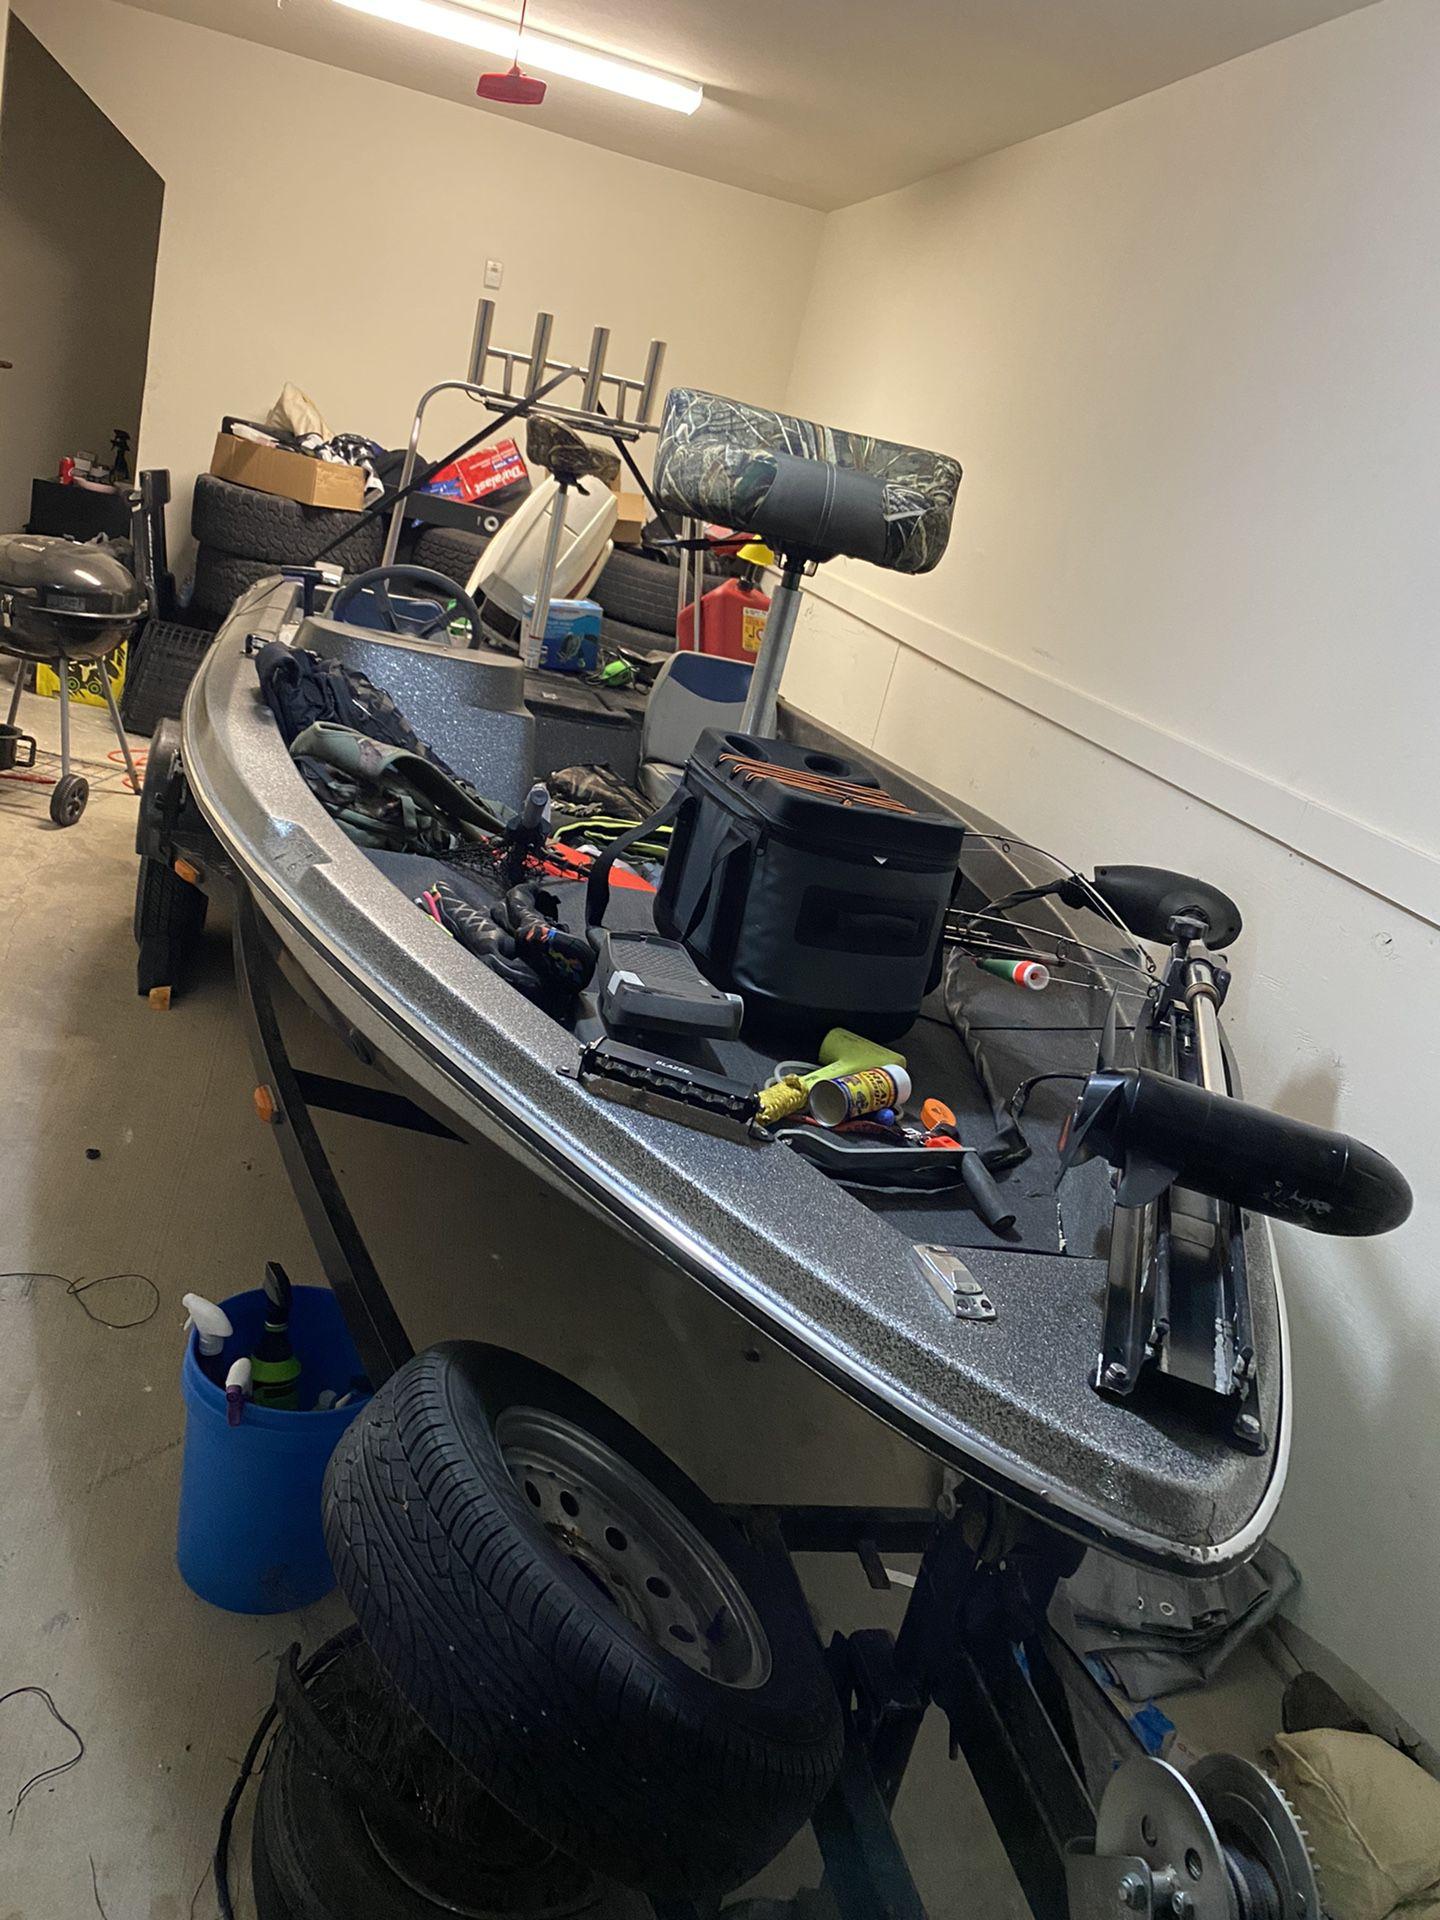 Photo 1993 tidecraft fiberglass bass boat 15 foot long with a 70 HP Johnson motor